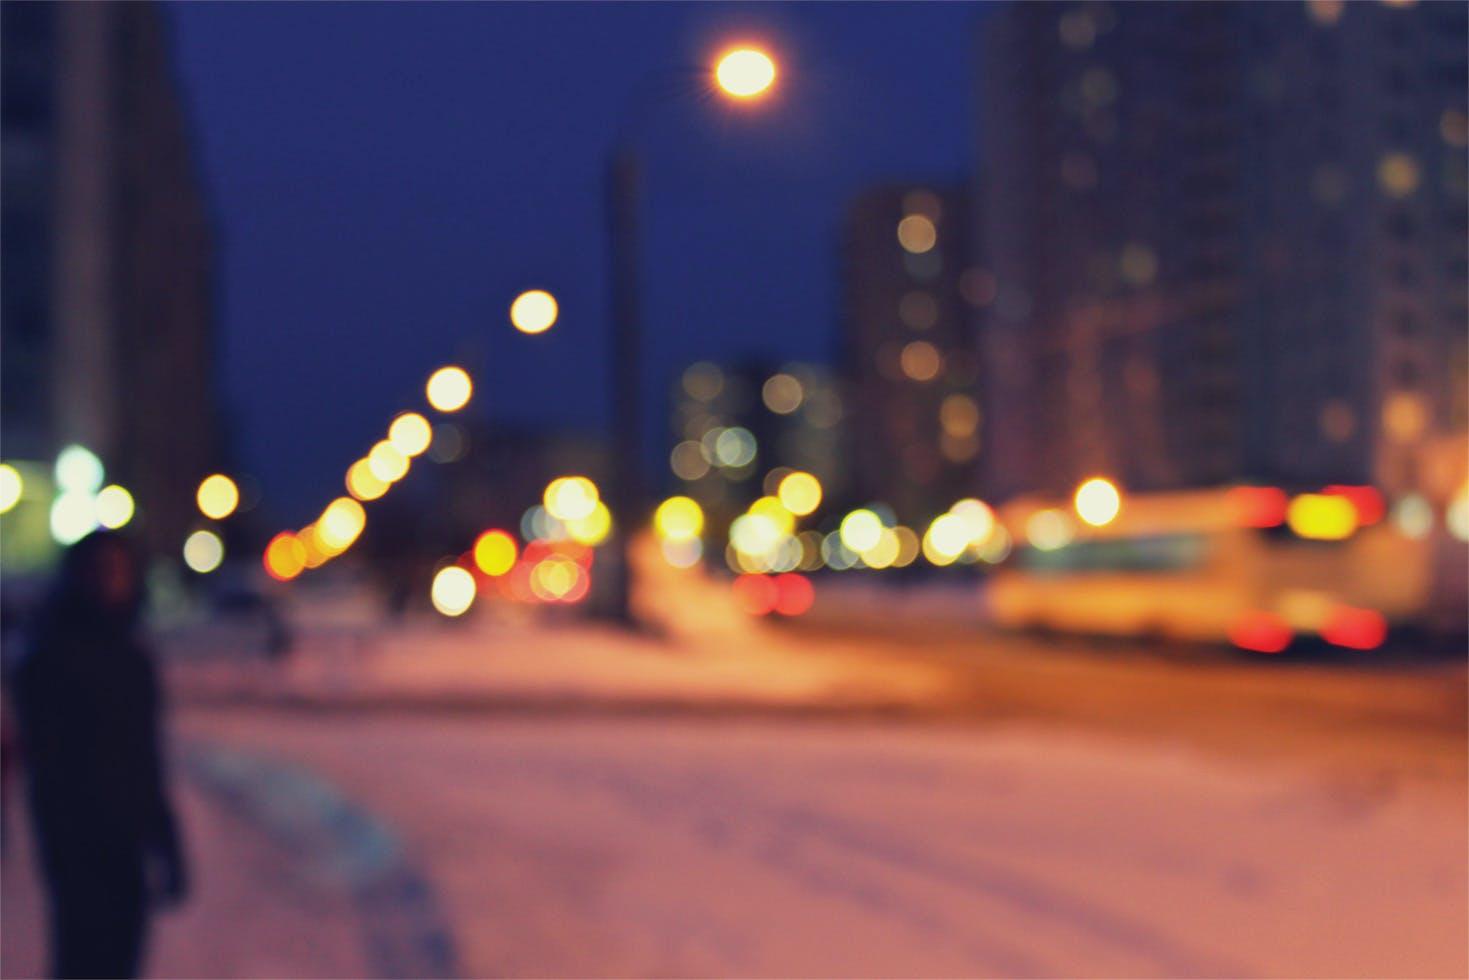 blurred city lights at night